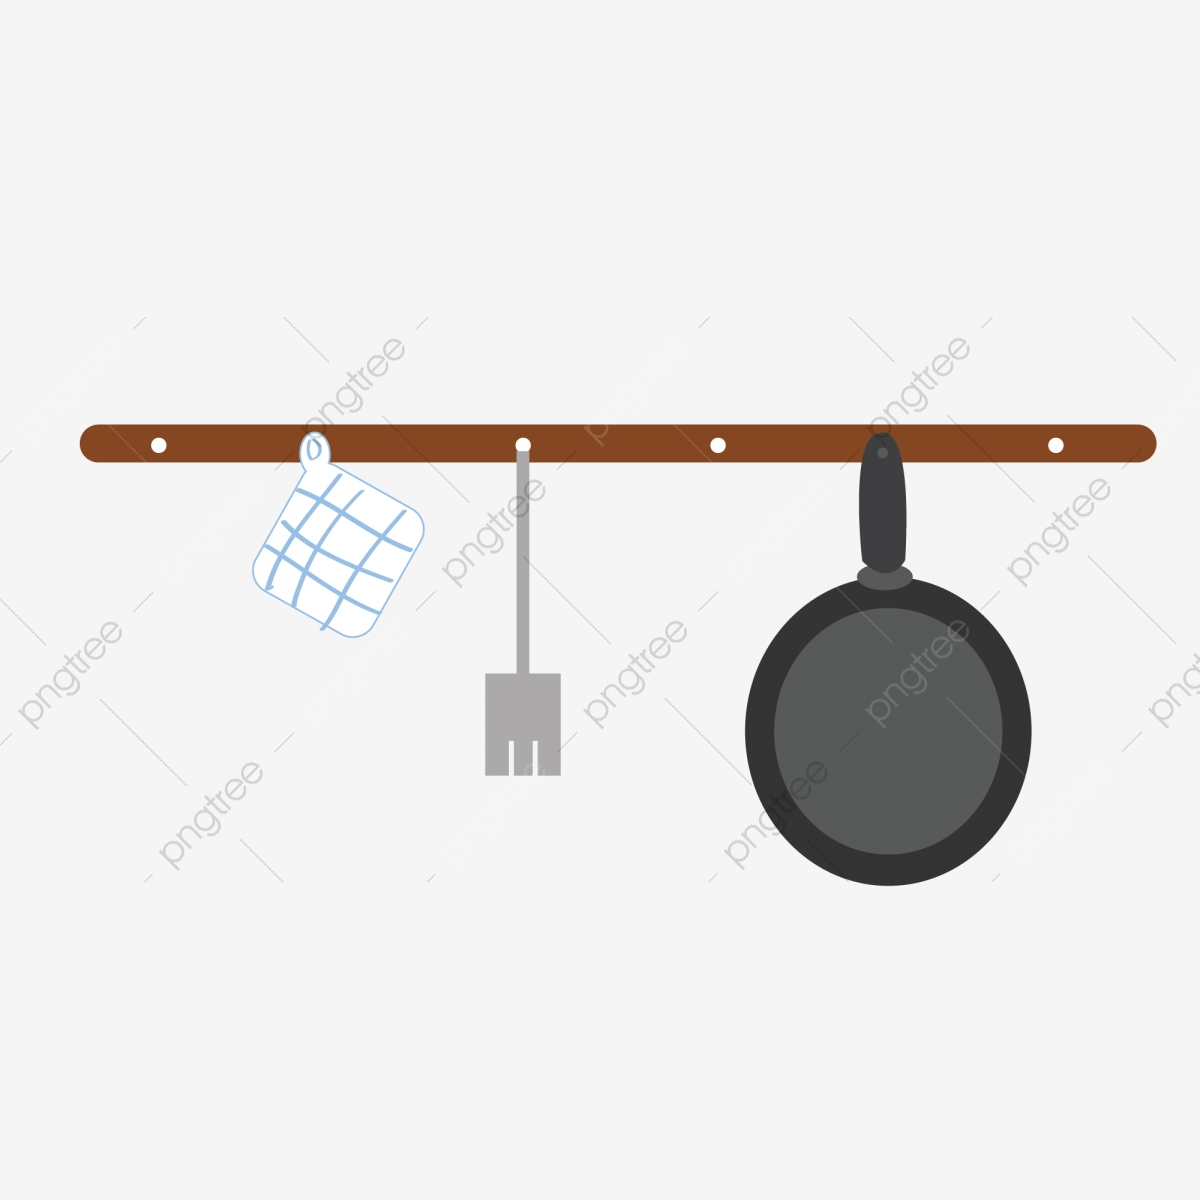 Diseño De Ai Dibujos Animados Utensilios Cocina Simple Dibujos ...